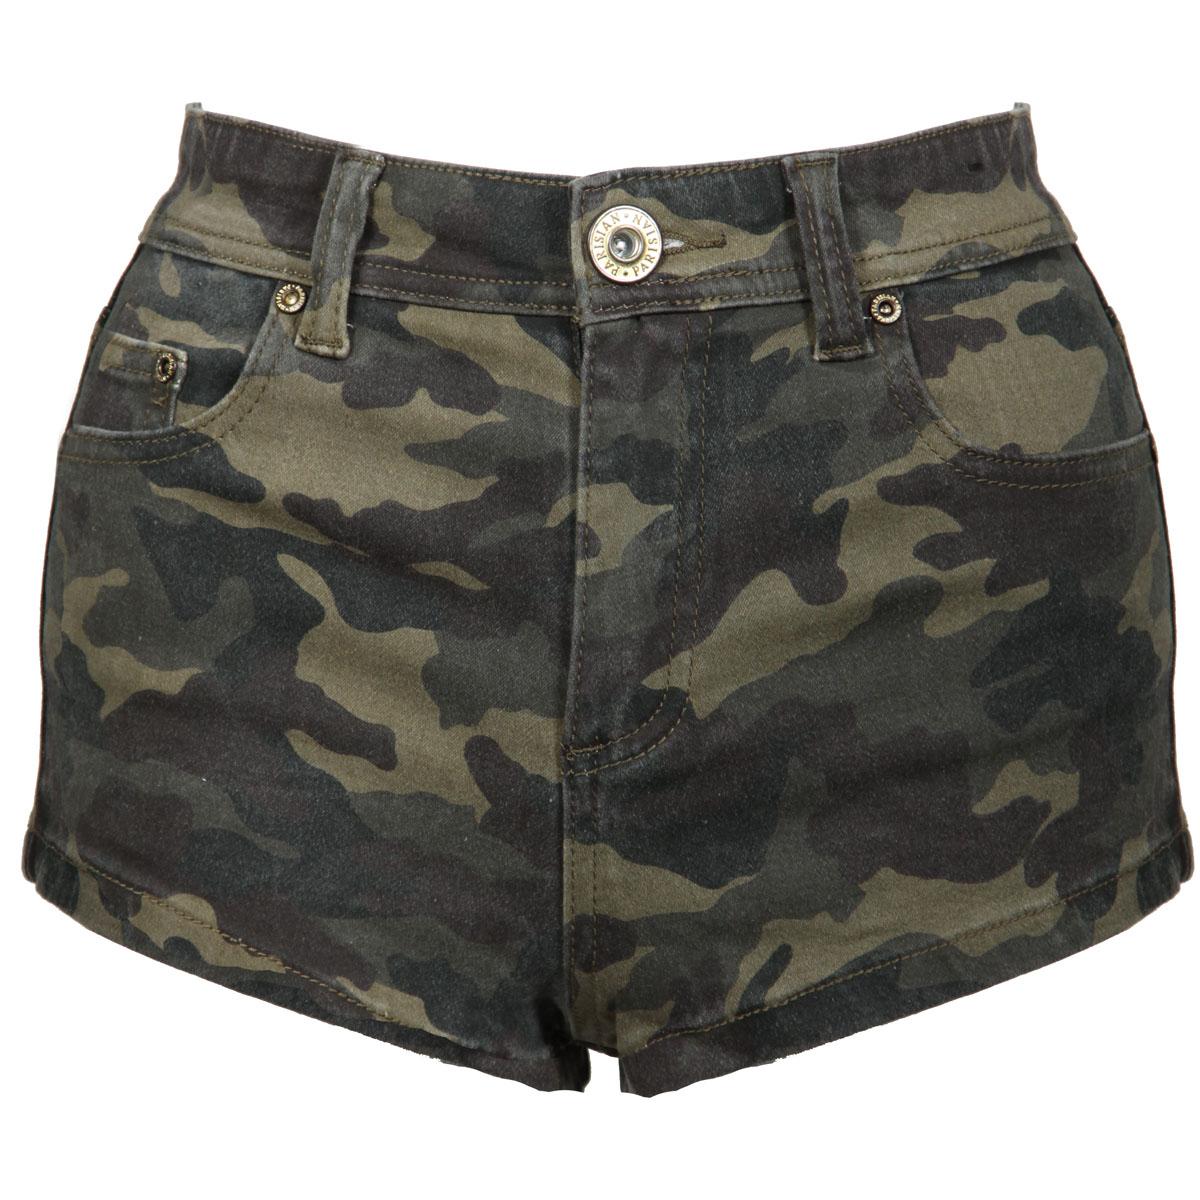 High waisted khaki shorts for women